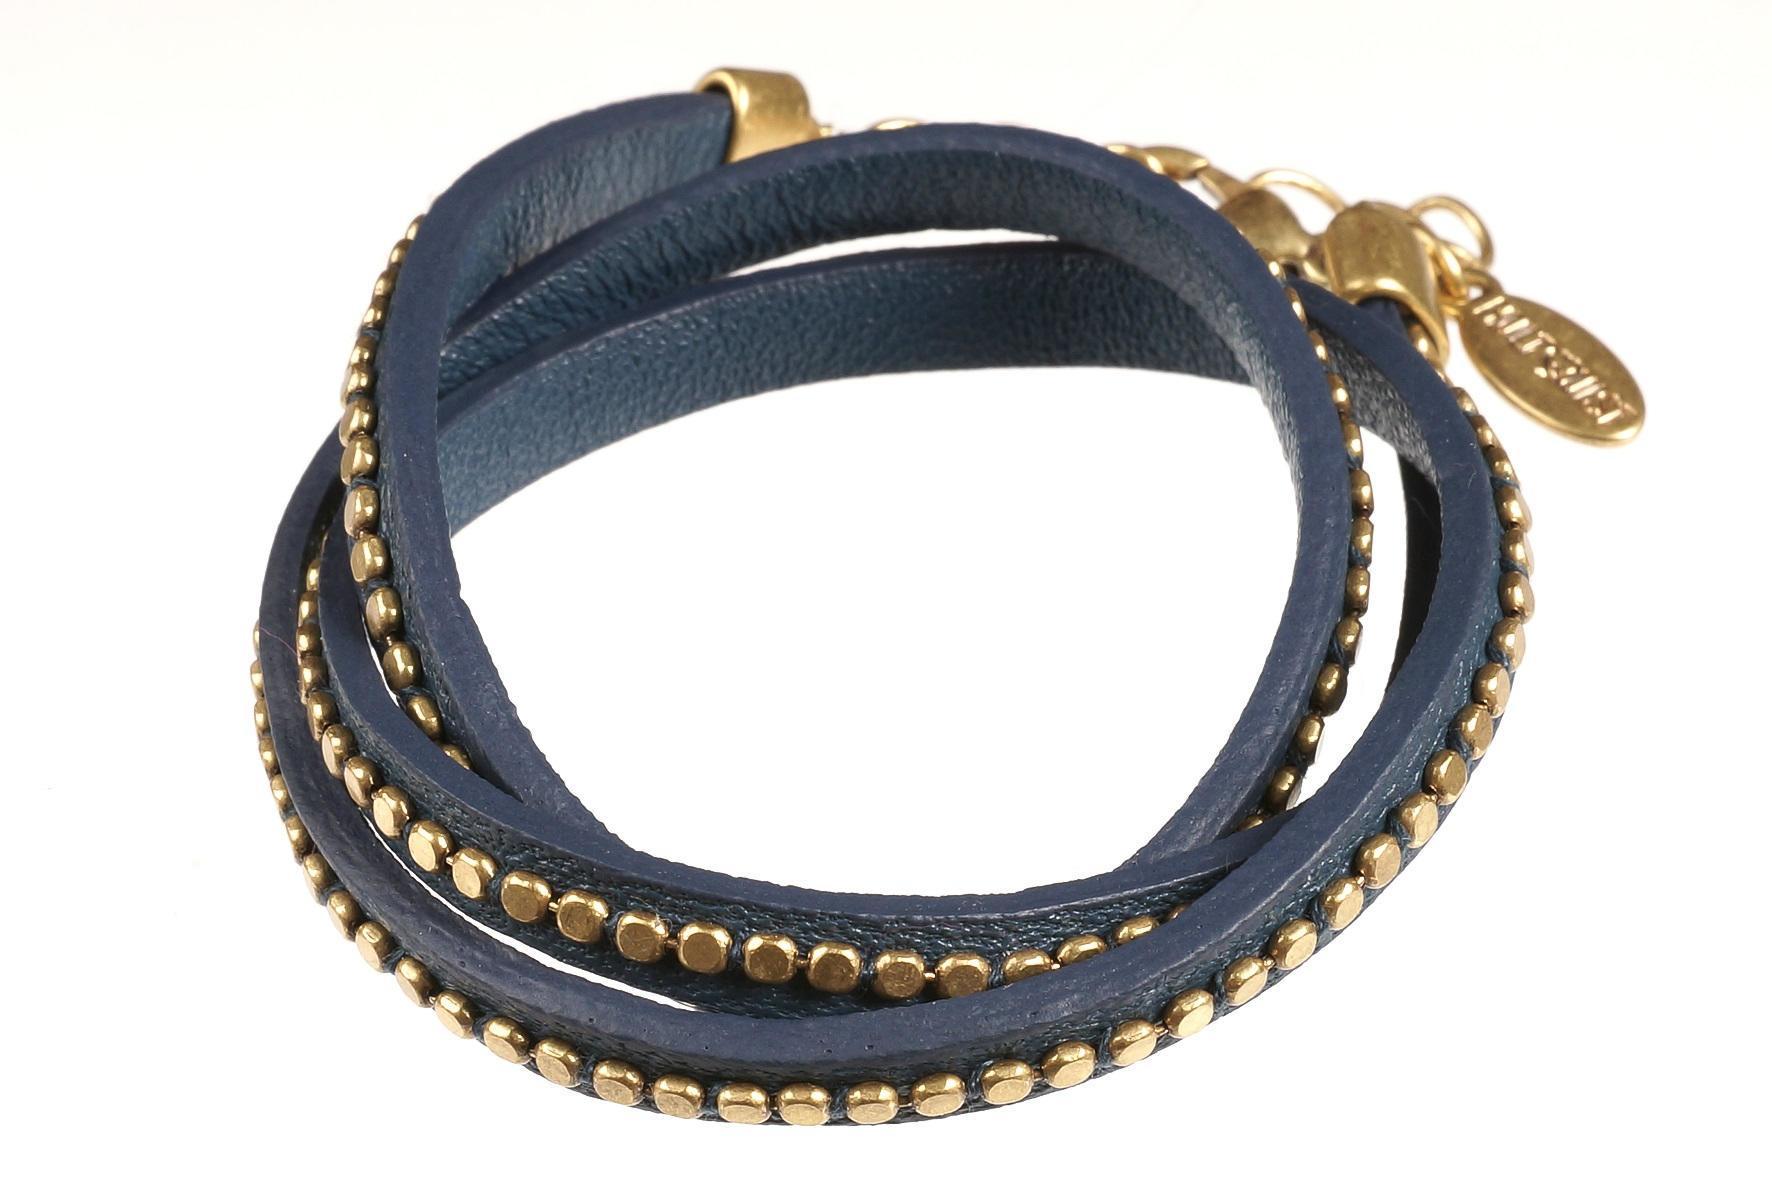 HULTQUIST Náramek Twist petrol, modrá barva B291007308E